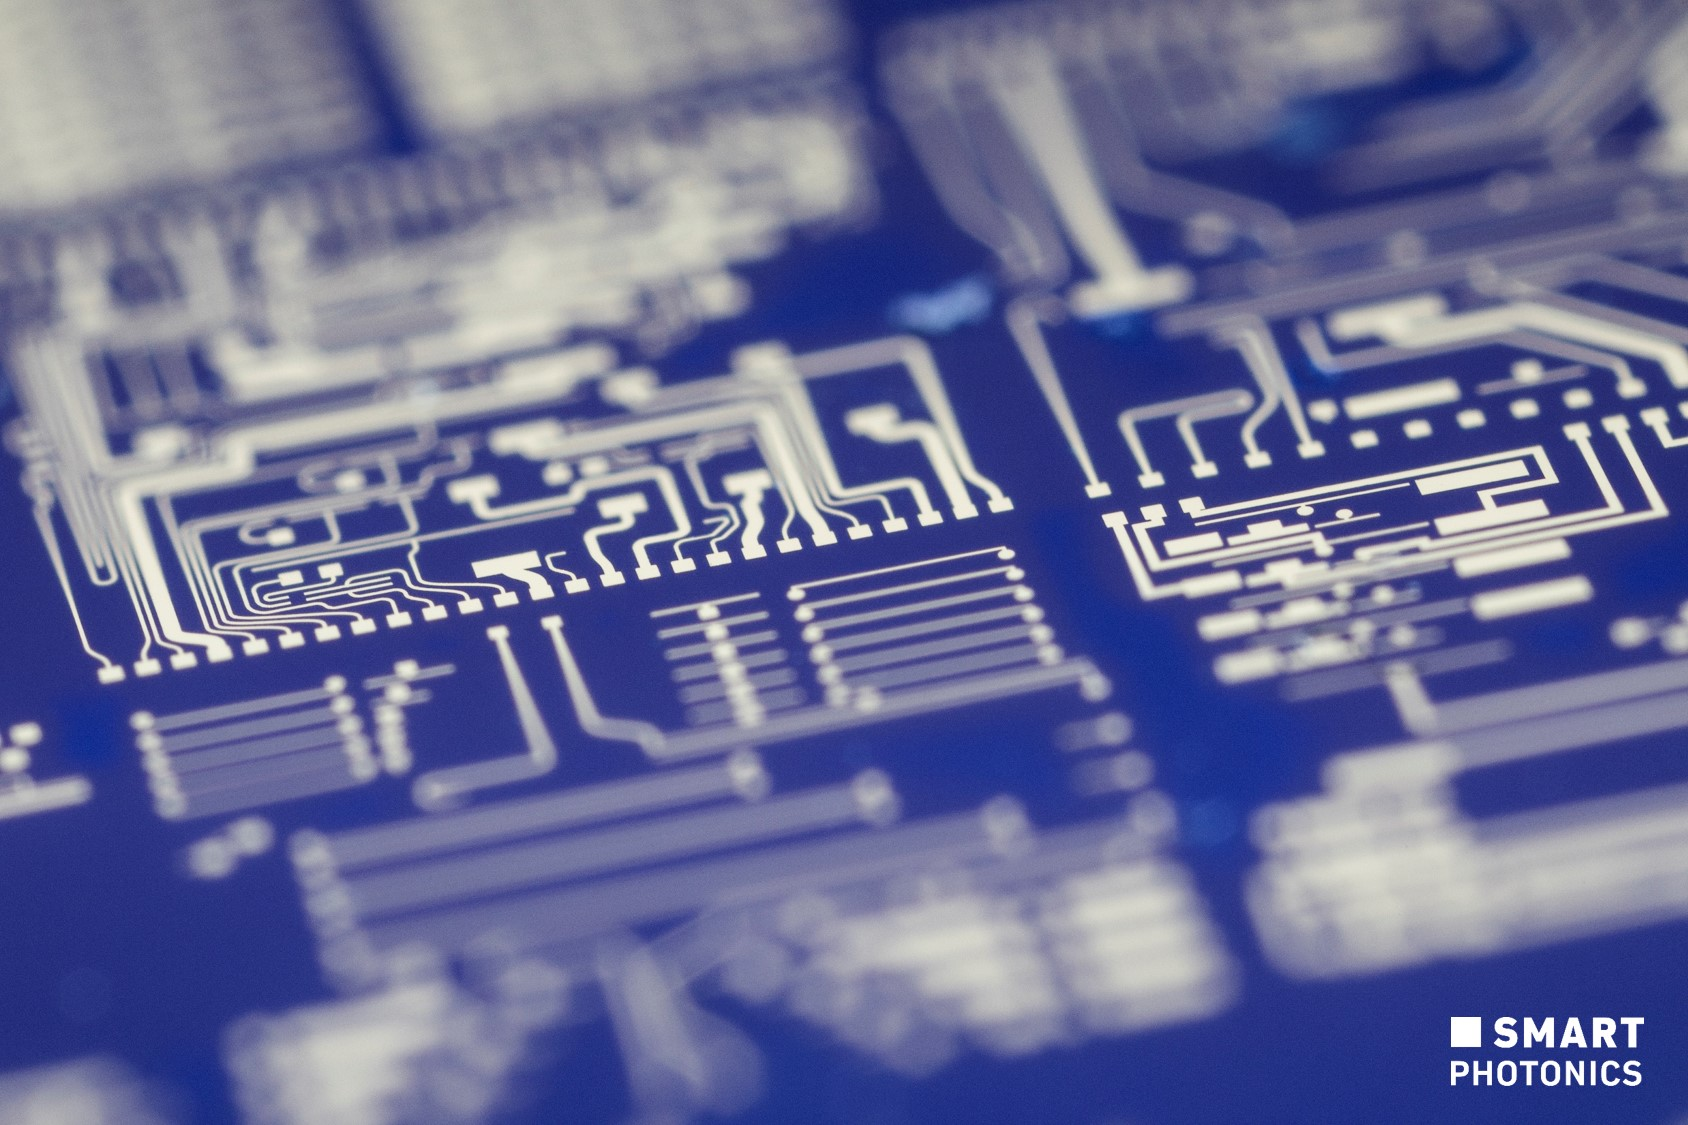 SMART Photonics - photonic integrated circuit